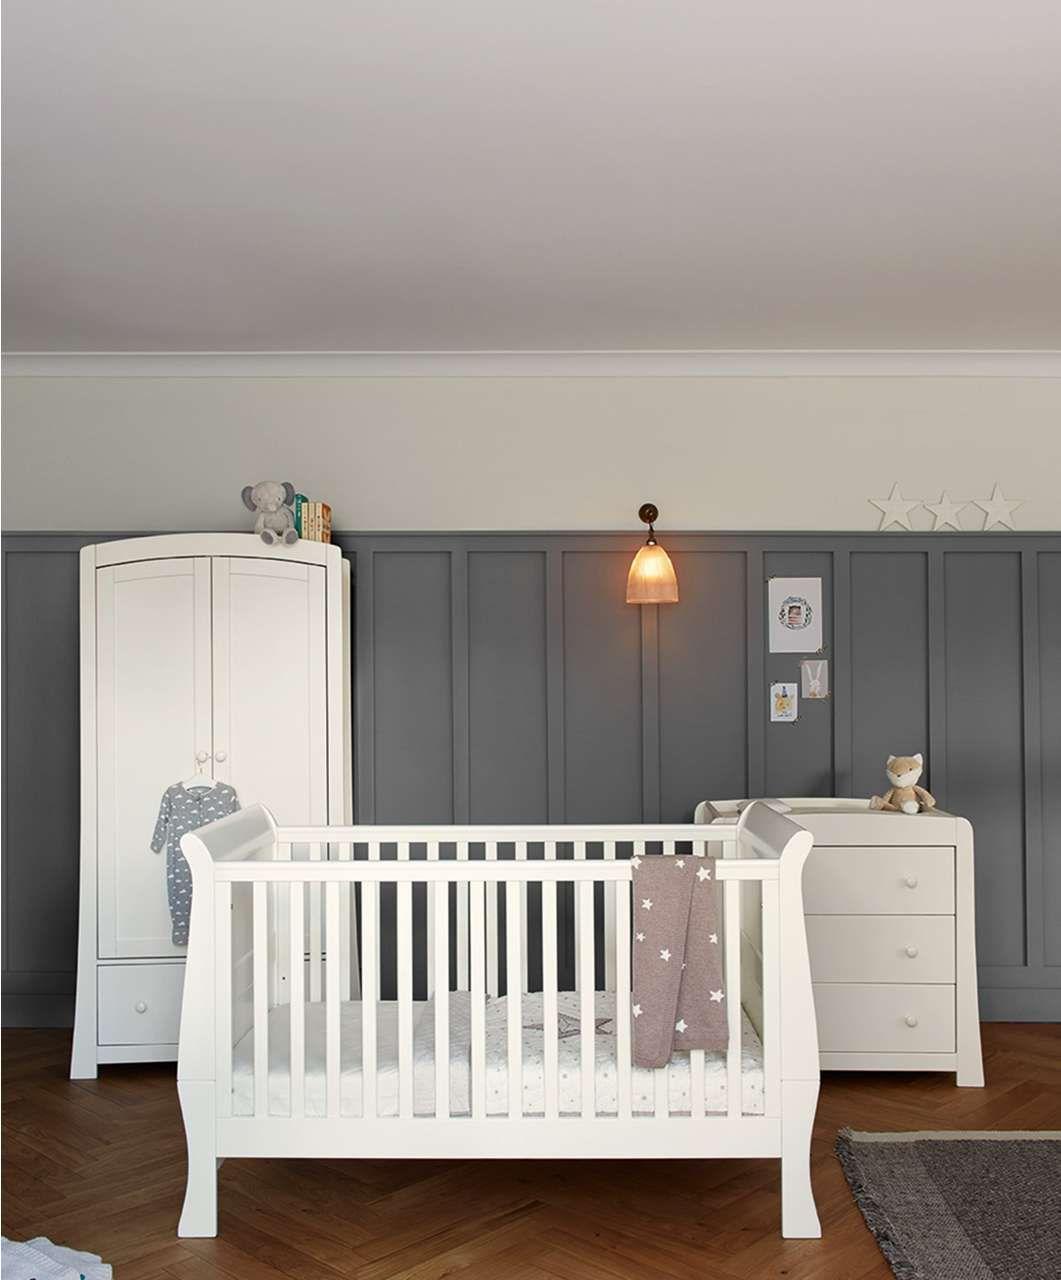 affordable nursery furniture sets on mamas papas baby nursery furniture sets white nursery furniture nursery furniture sets white pinterest